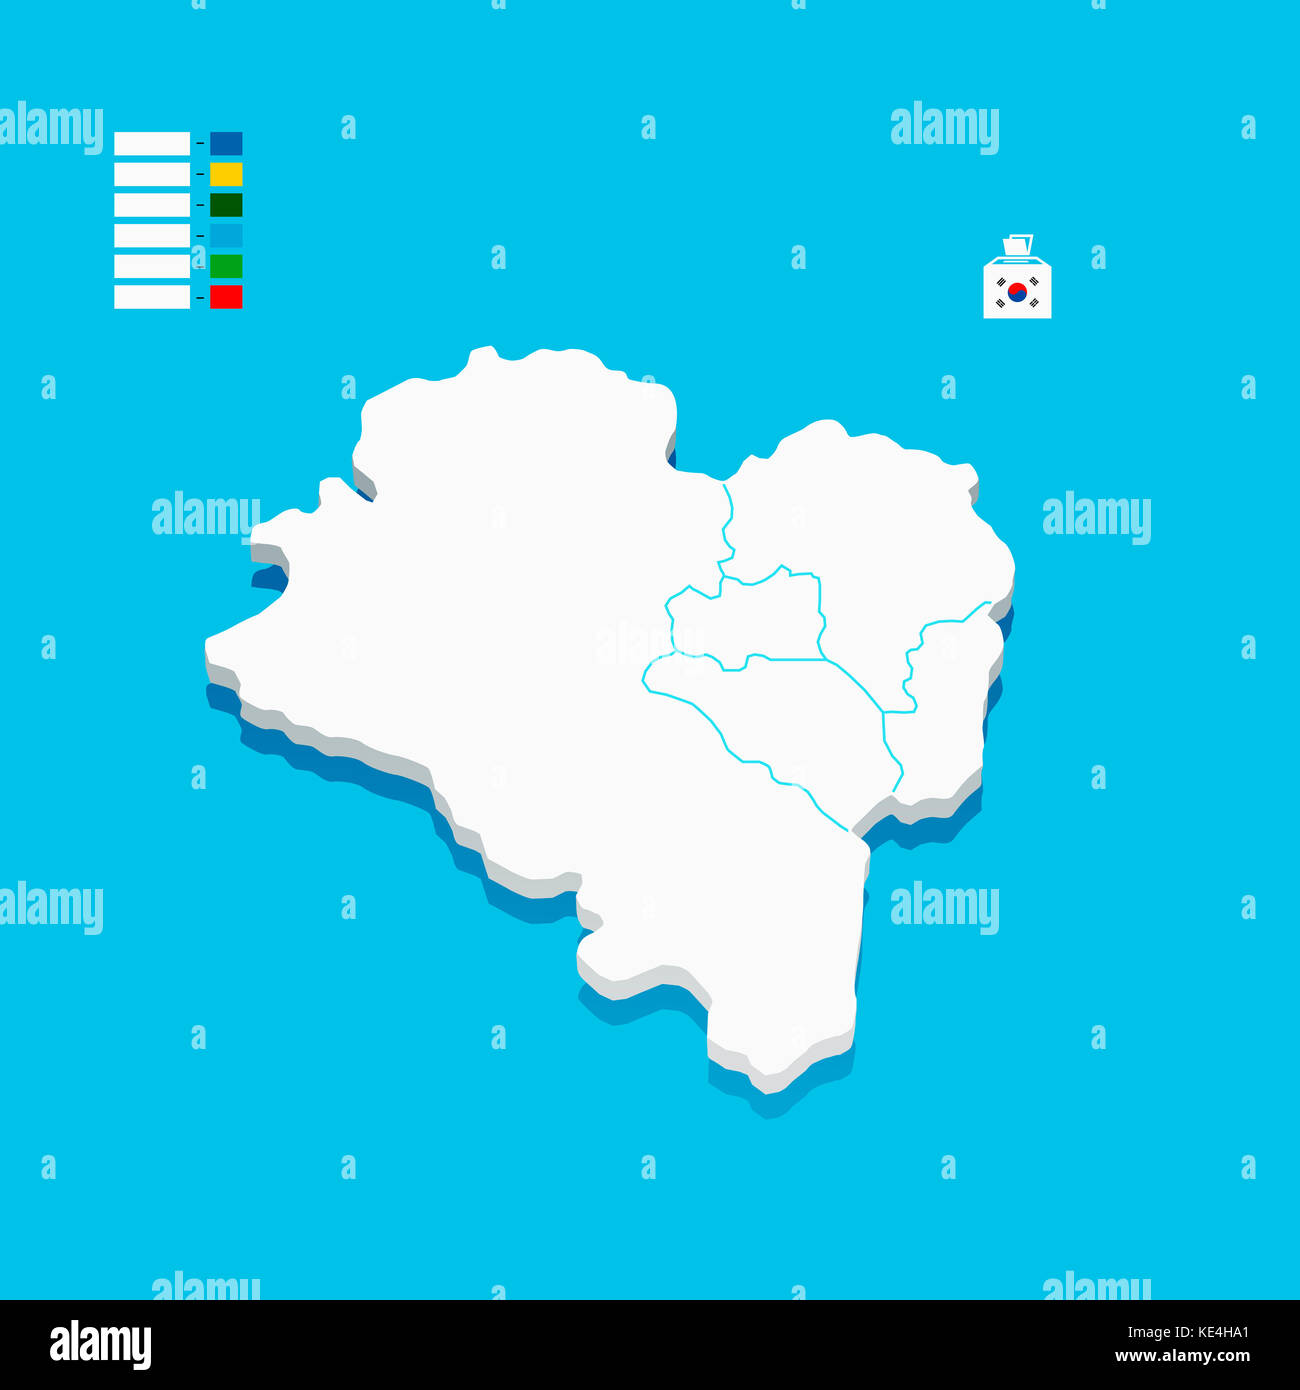 Ulsan Korea Map.Infographic Map Of Ulsan City In Korea Stock Photo 163599913 Alamy